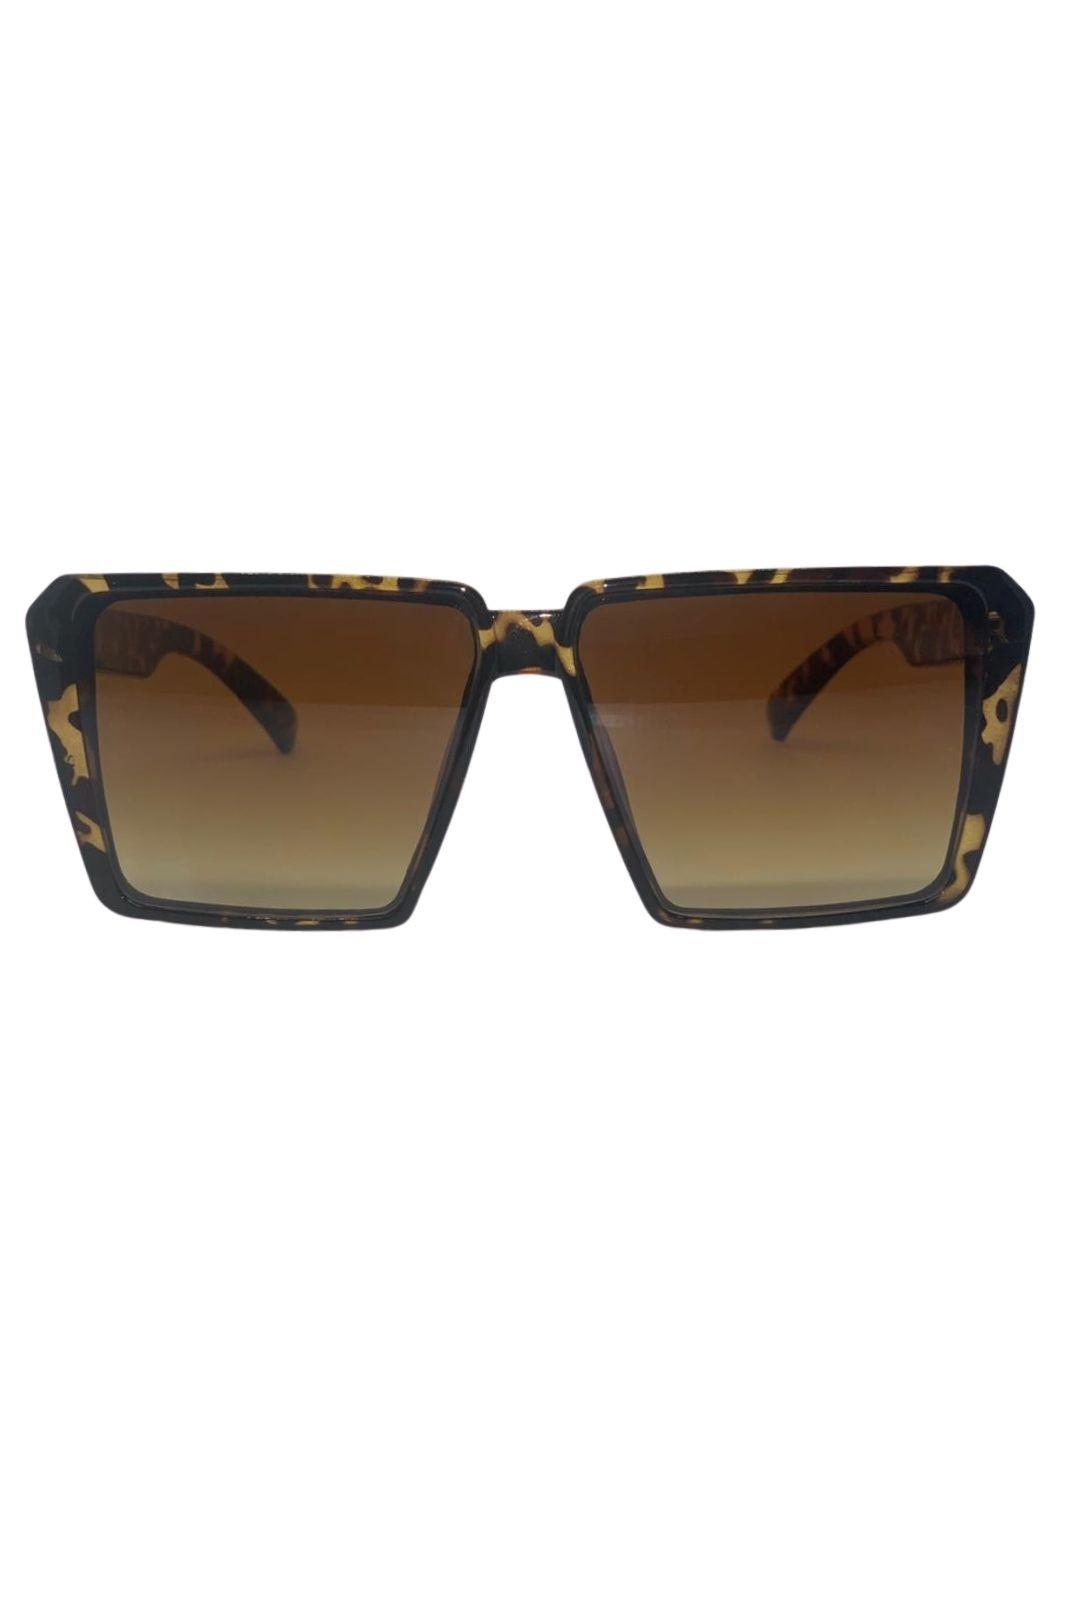 Óculos Ilha Bela Oncinha